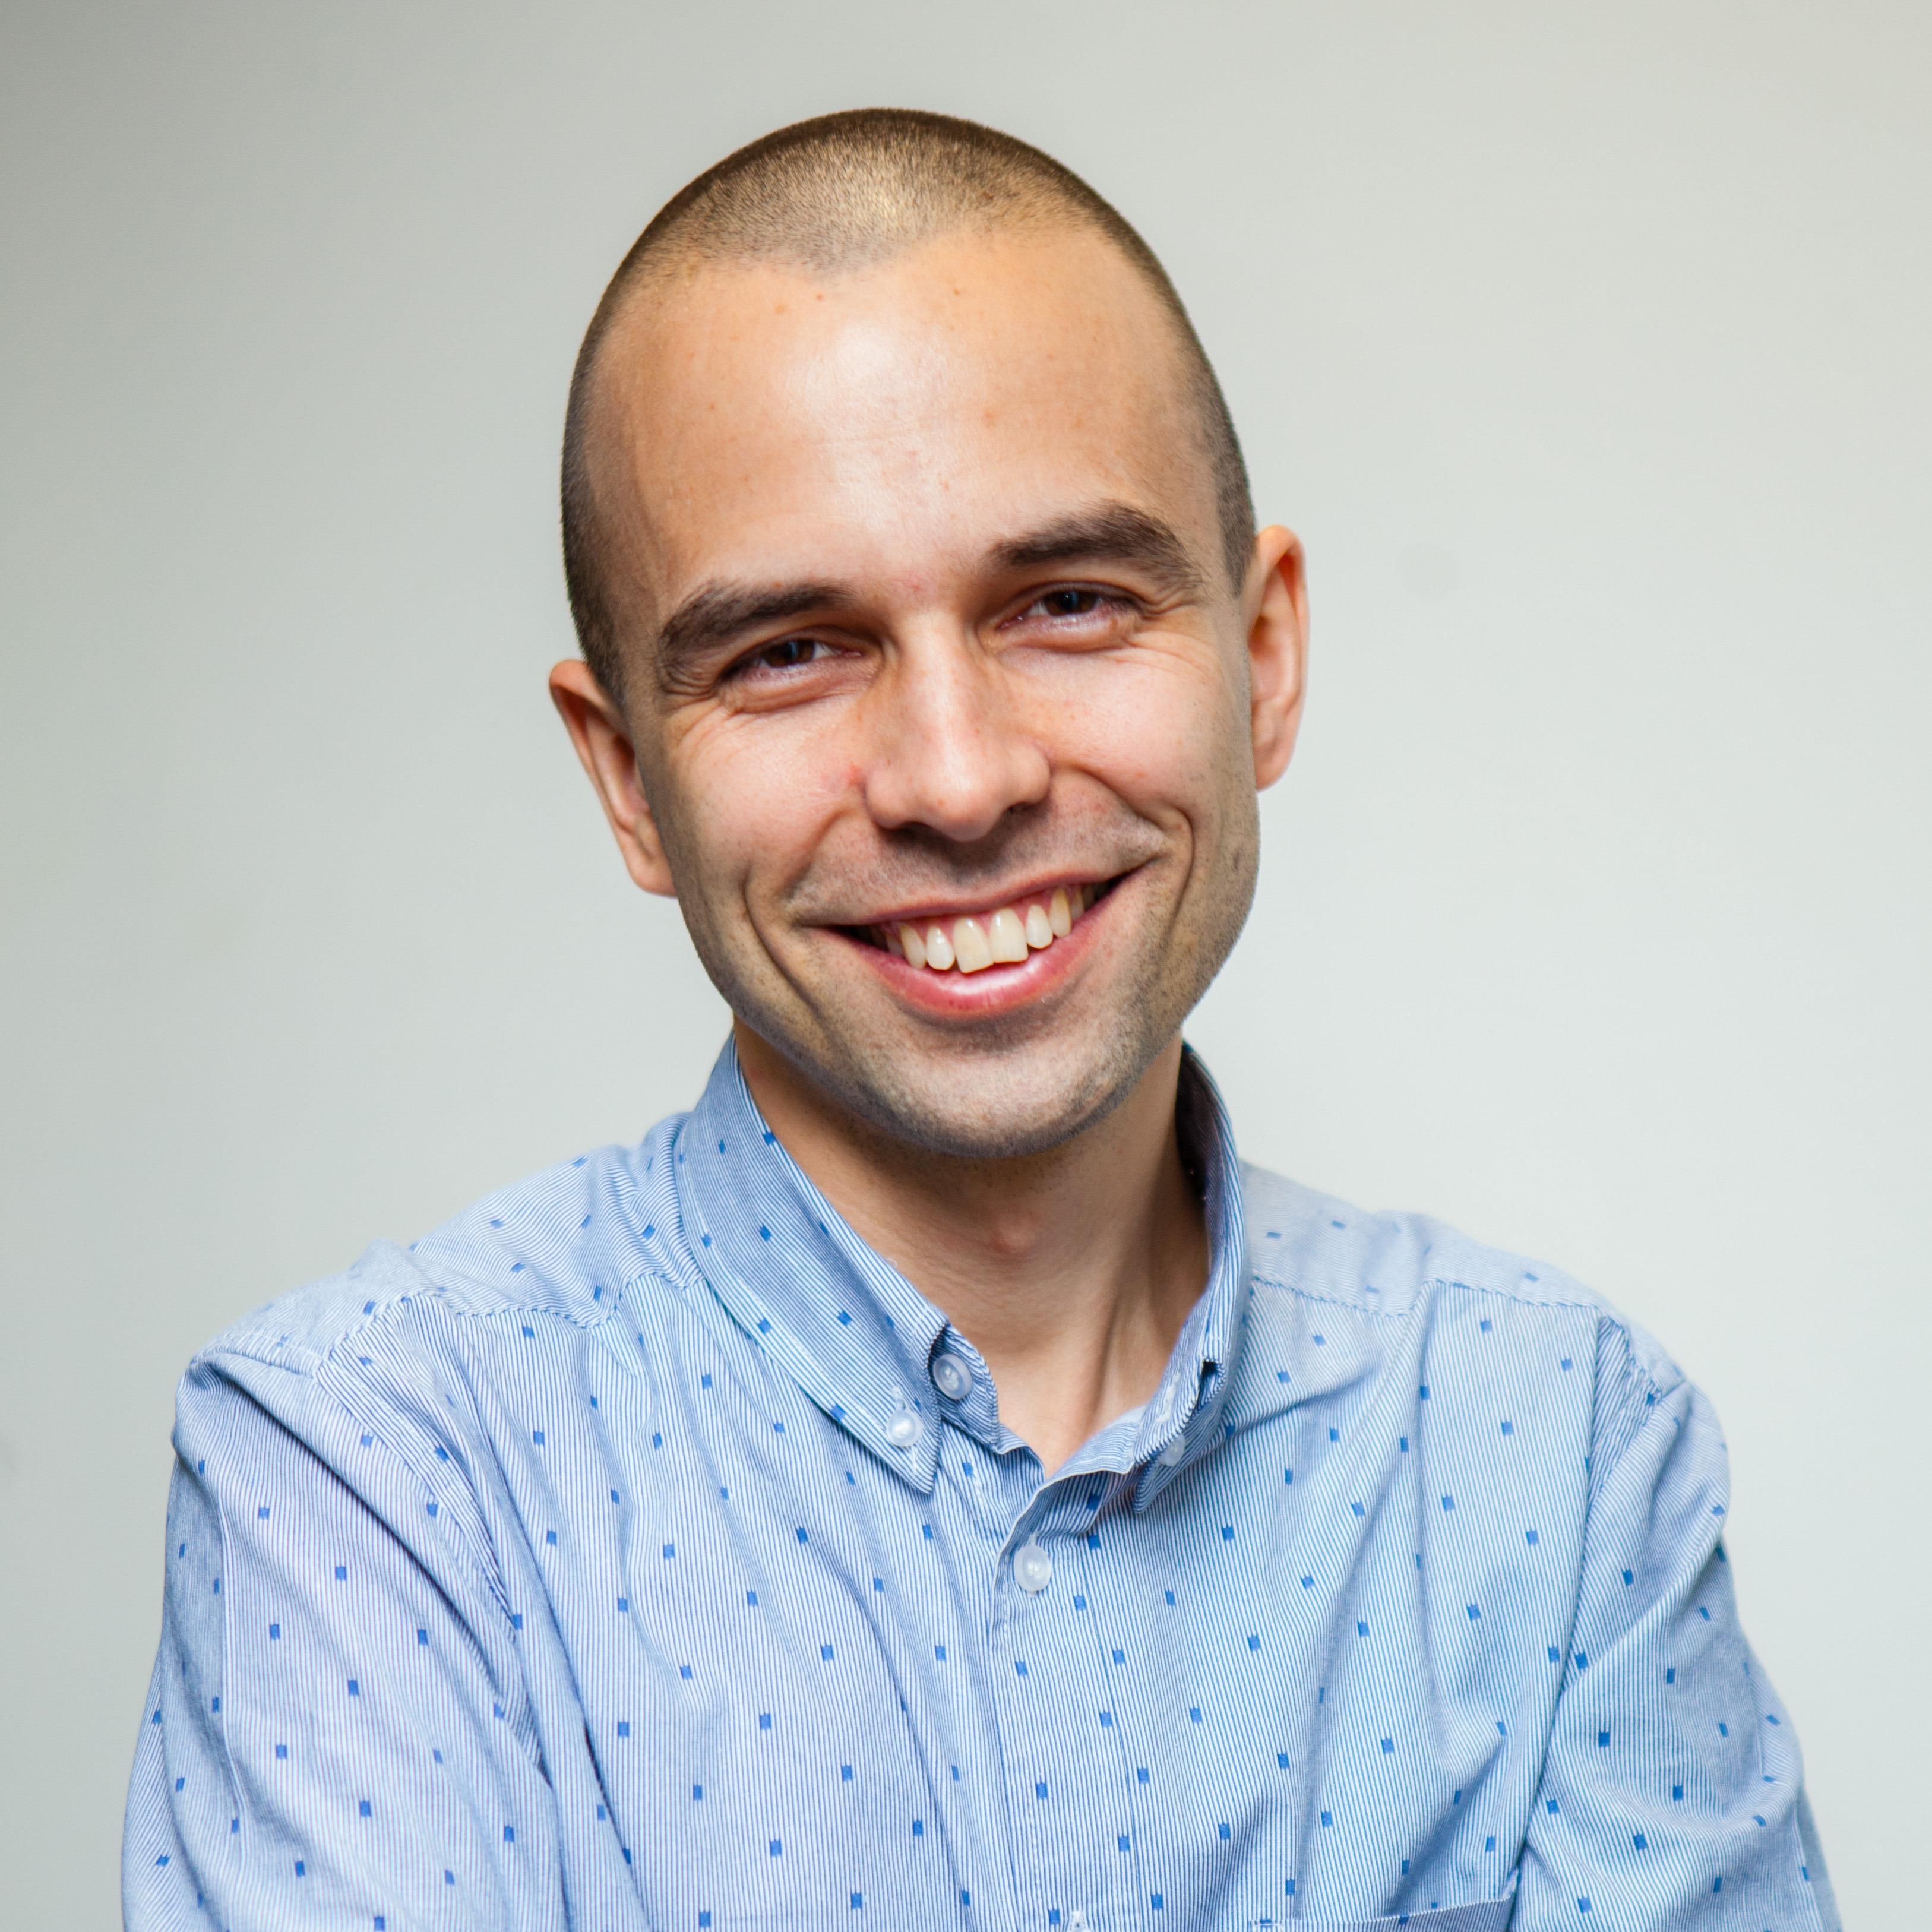 Павел Цимбаленко